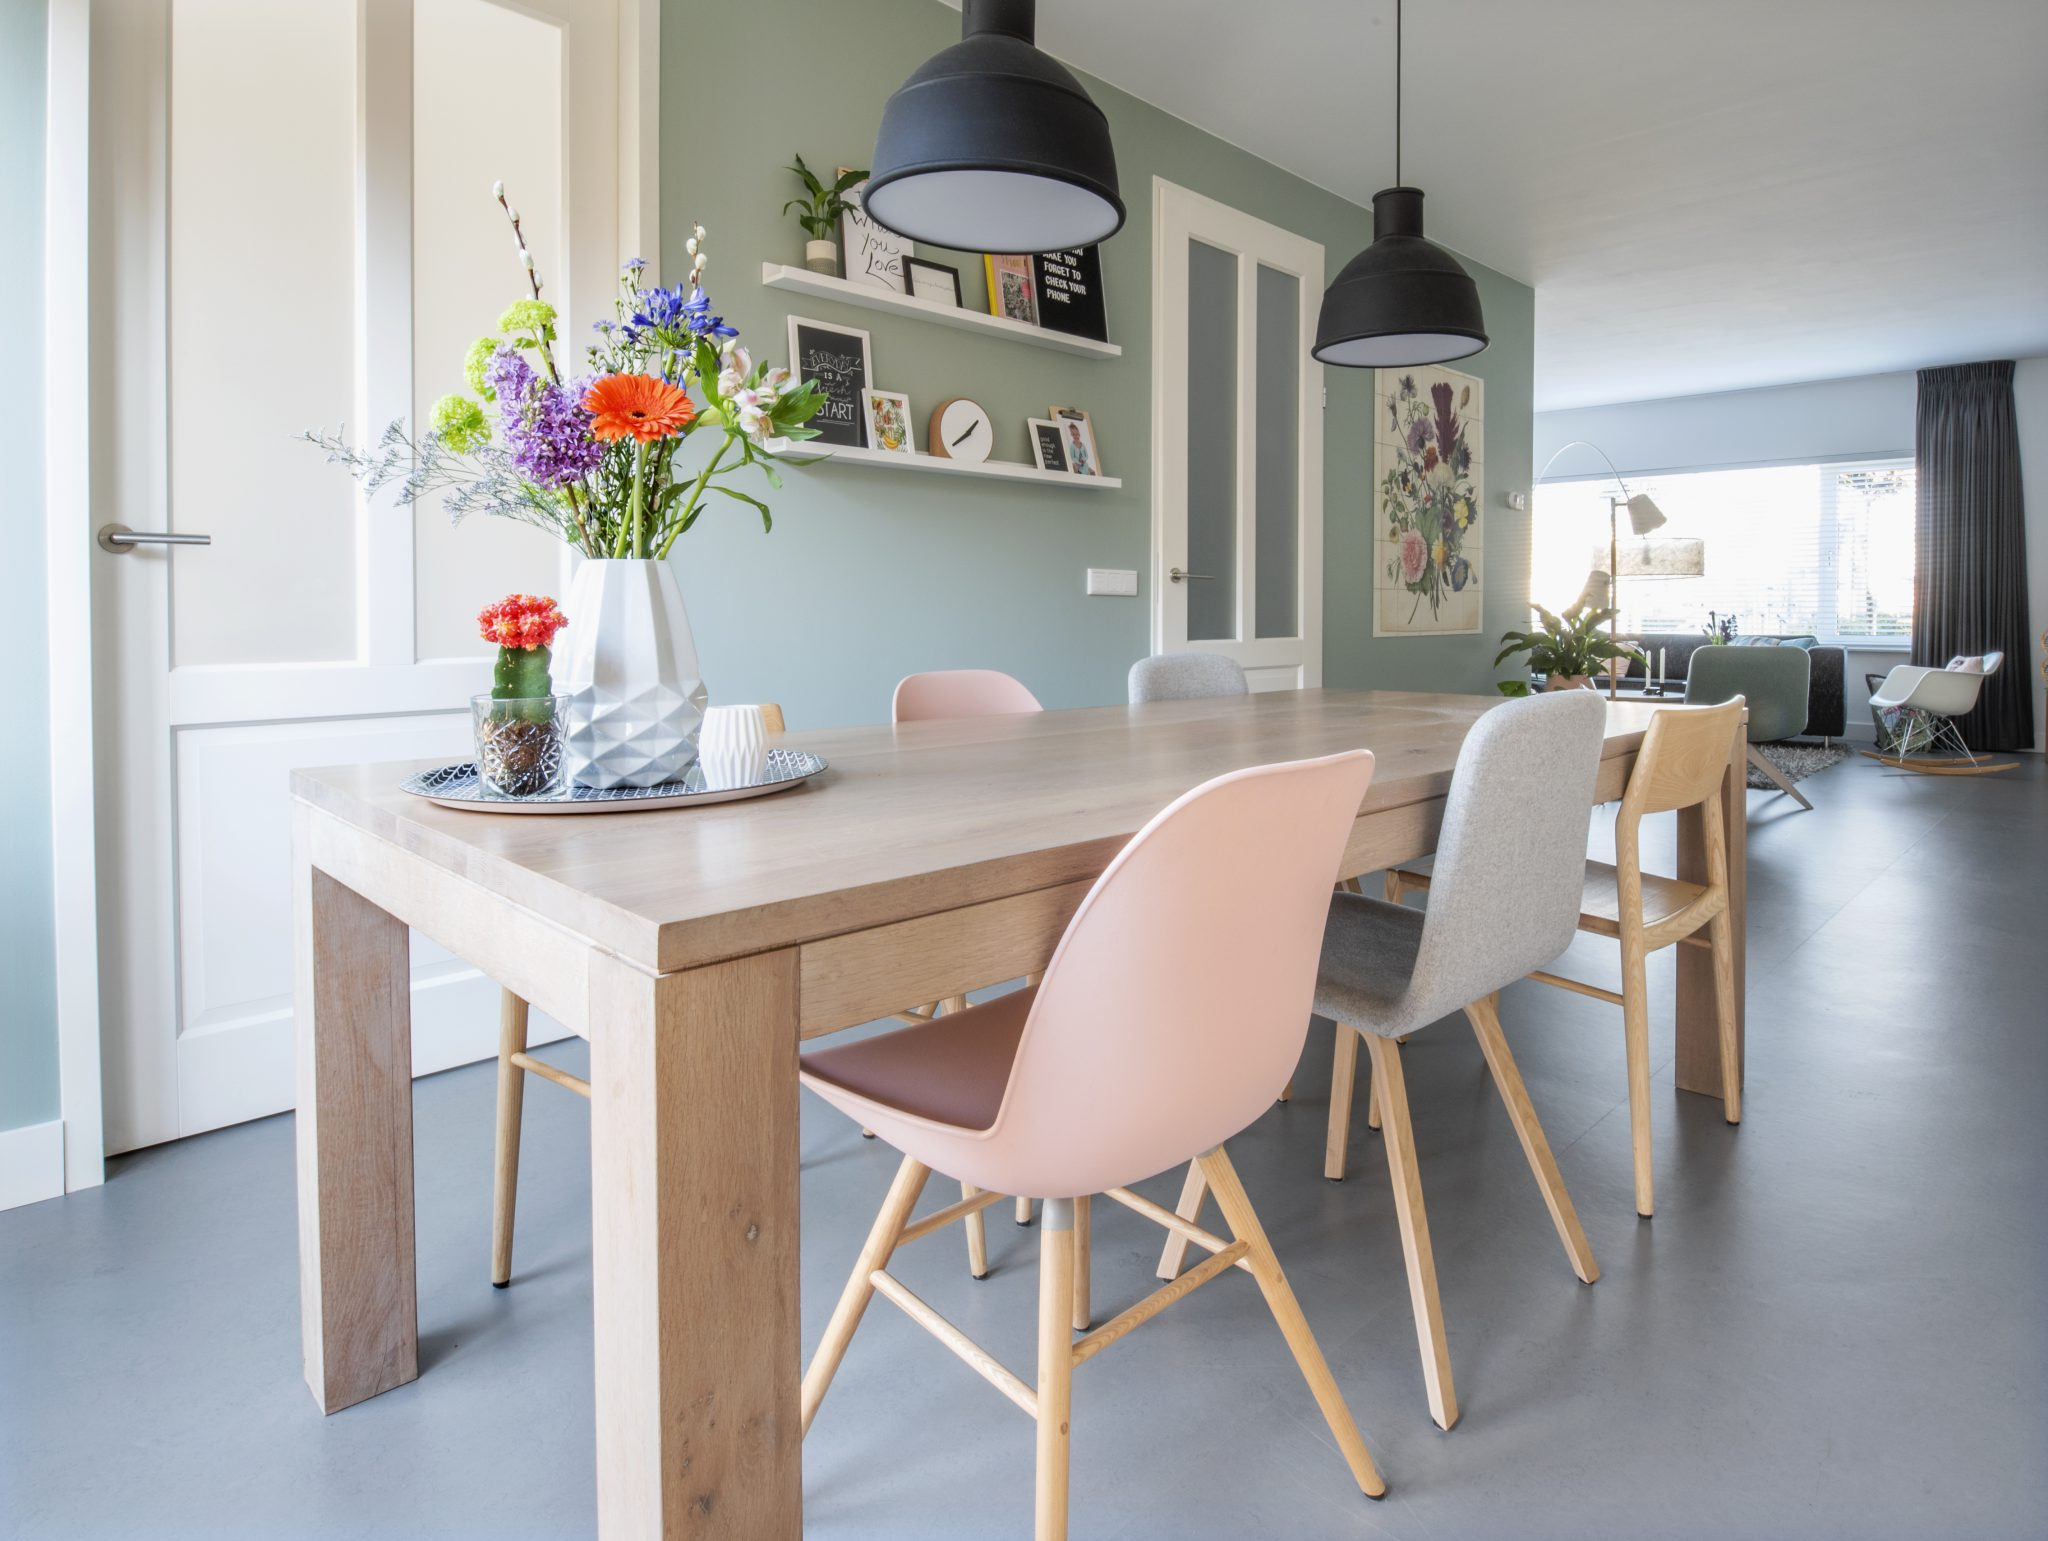 eettafel_verschillende_stoelen_interieur_styling_advies